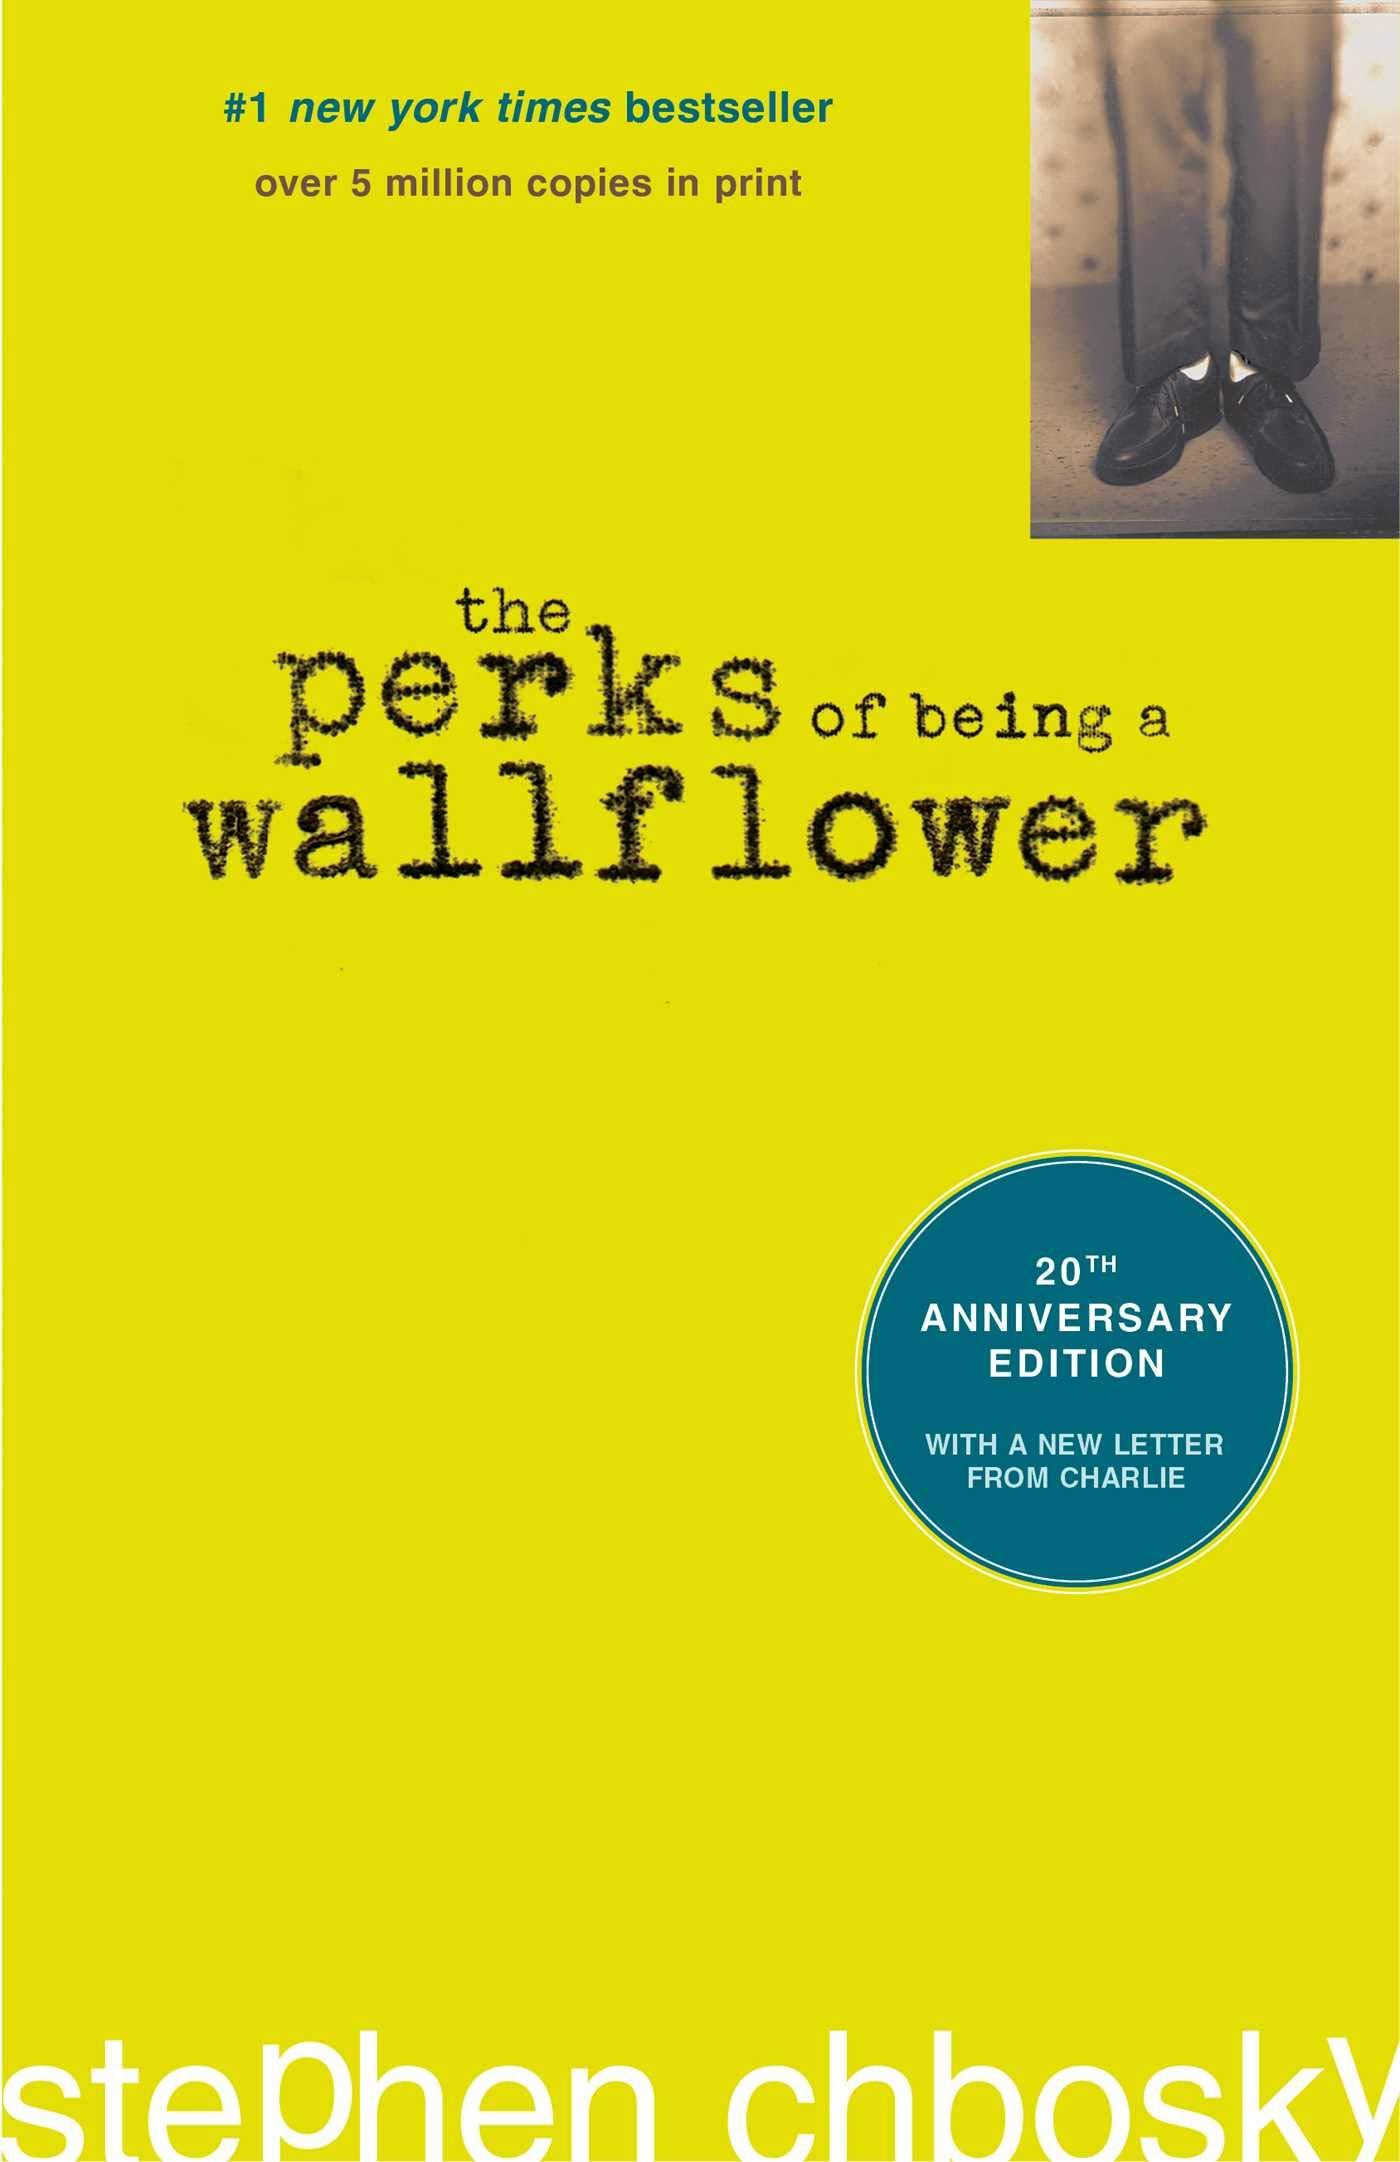 stephen chbosky perks of being a wallflower